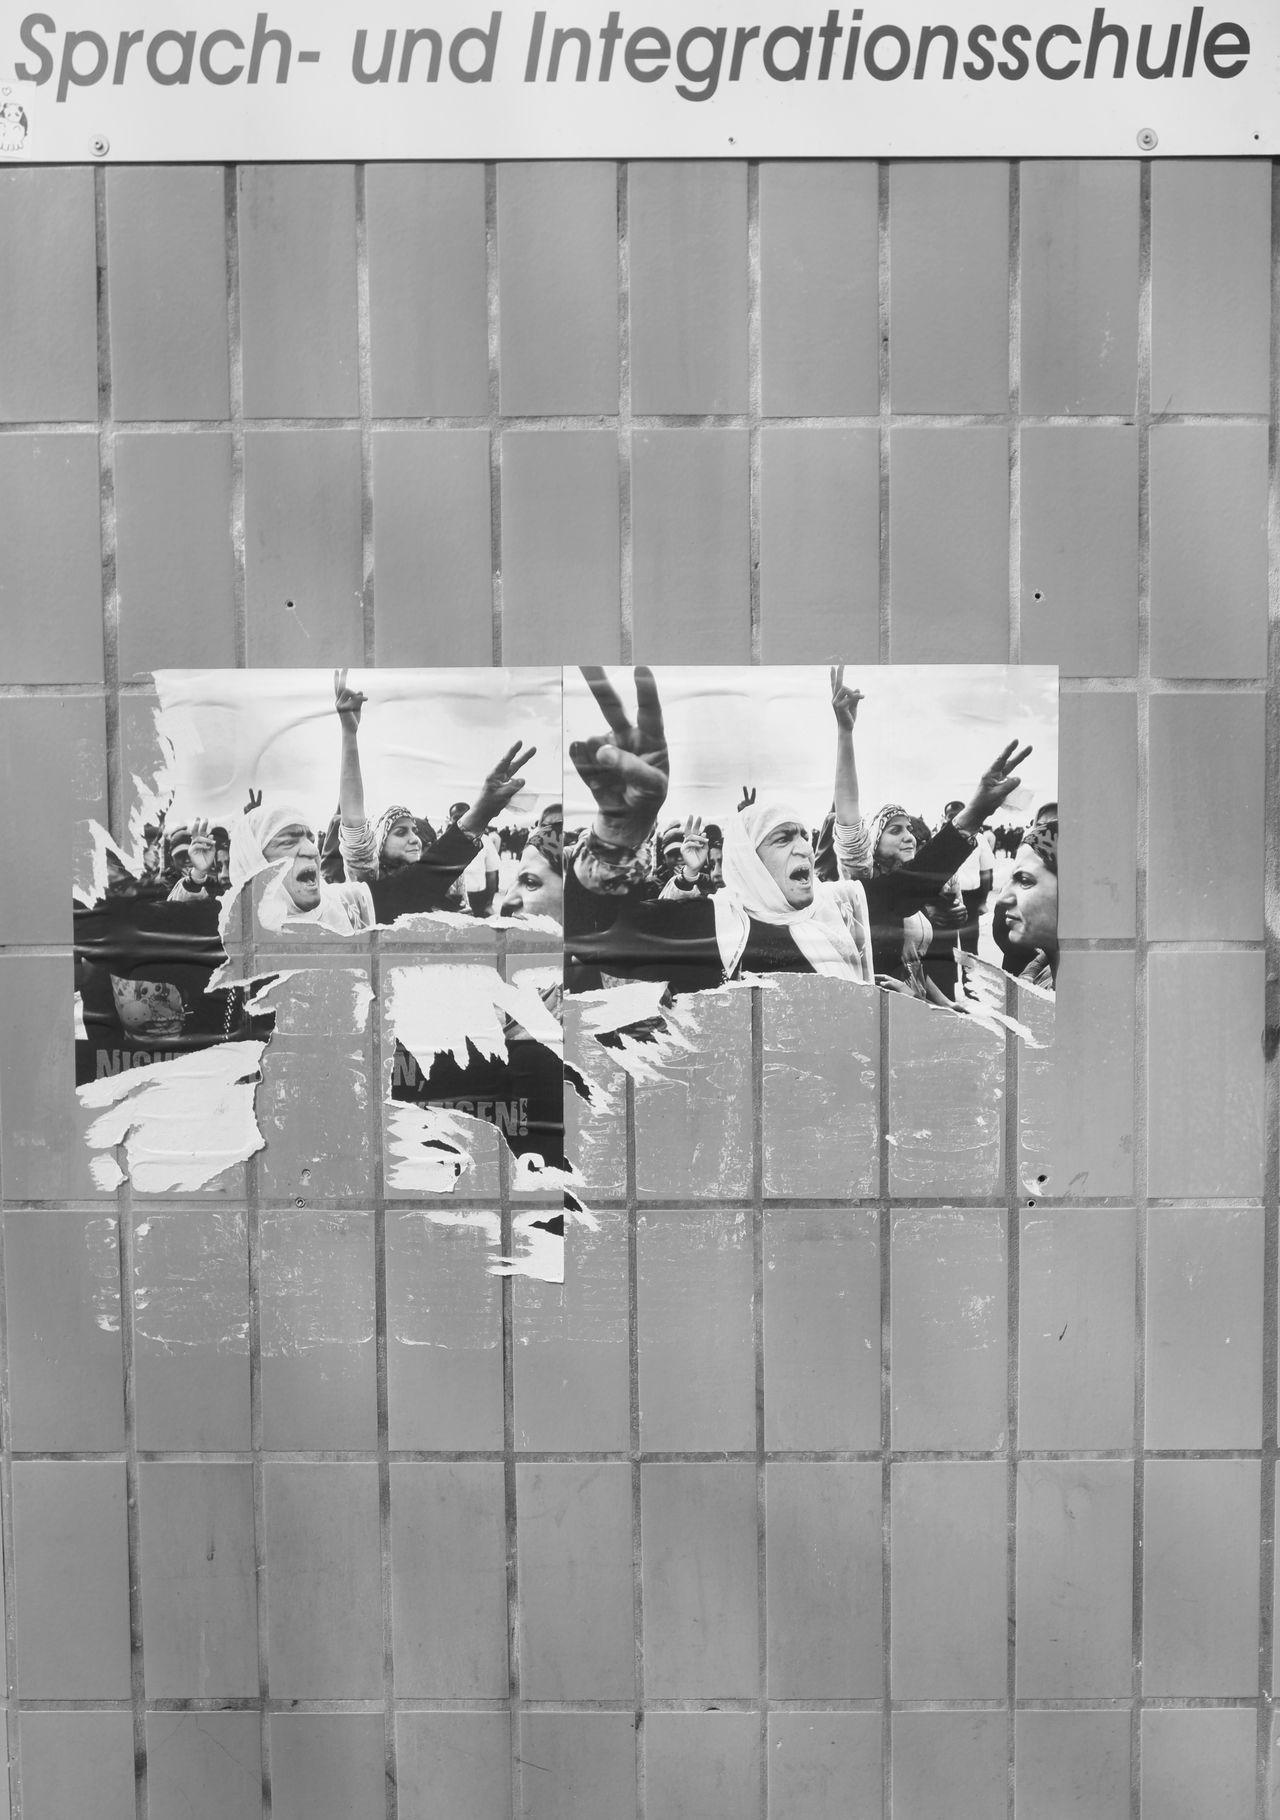 Blackandwhite Integration Migration Monochrome No People Poster Revolution Schule Text Wall Zuwanderung